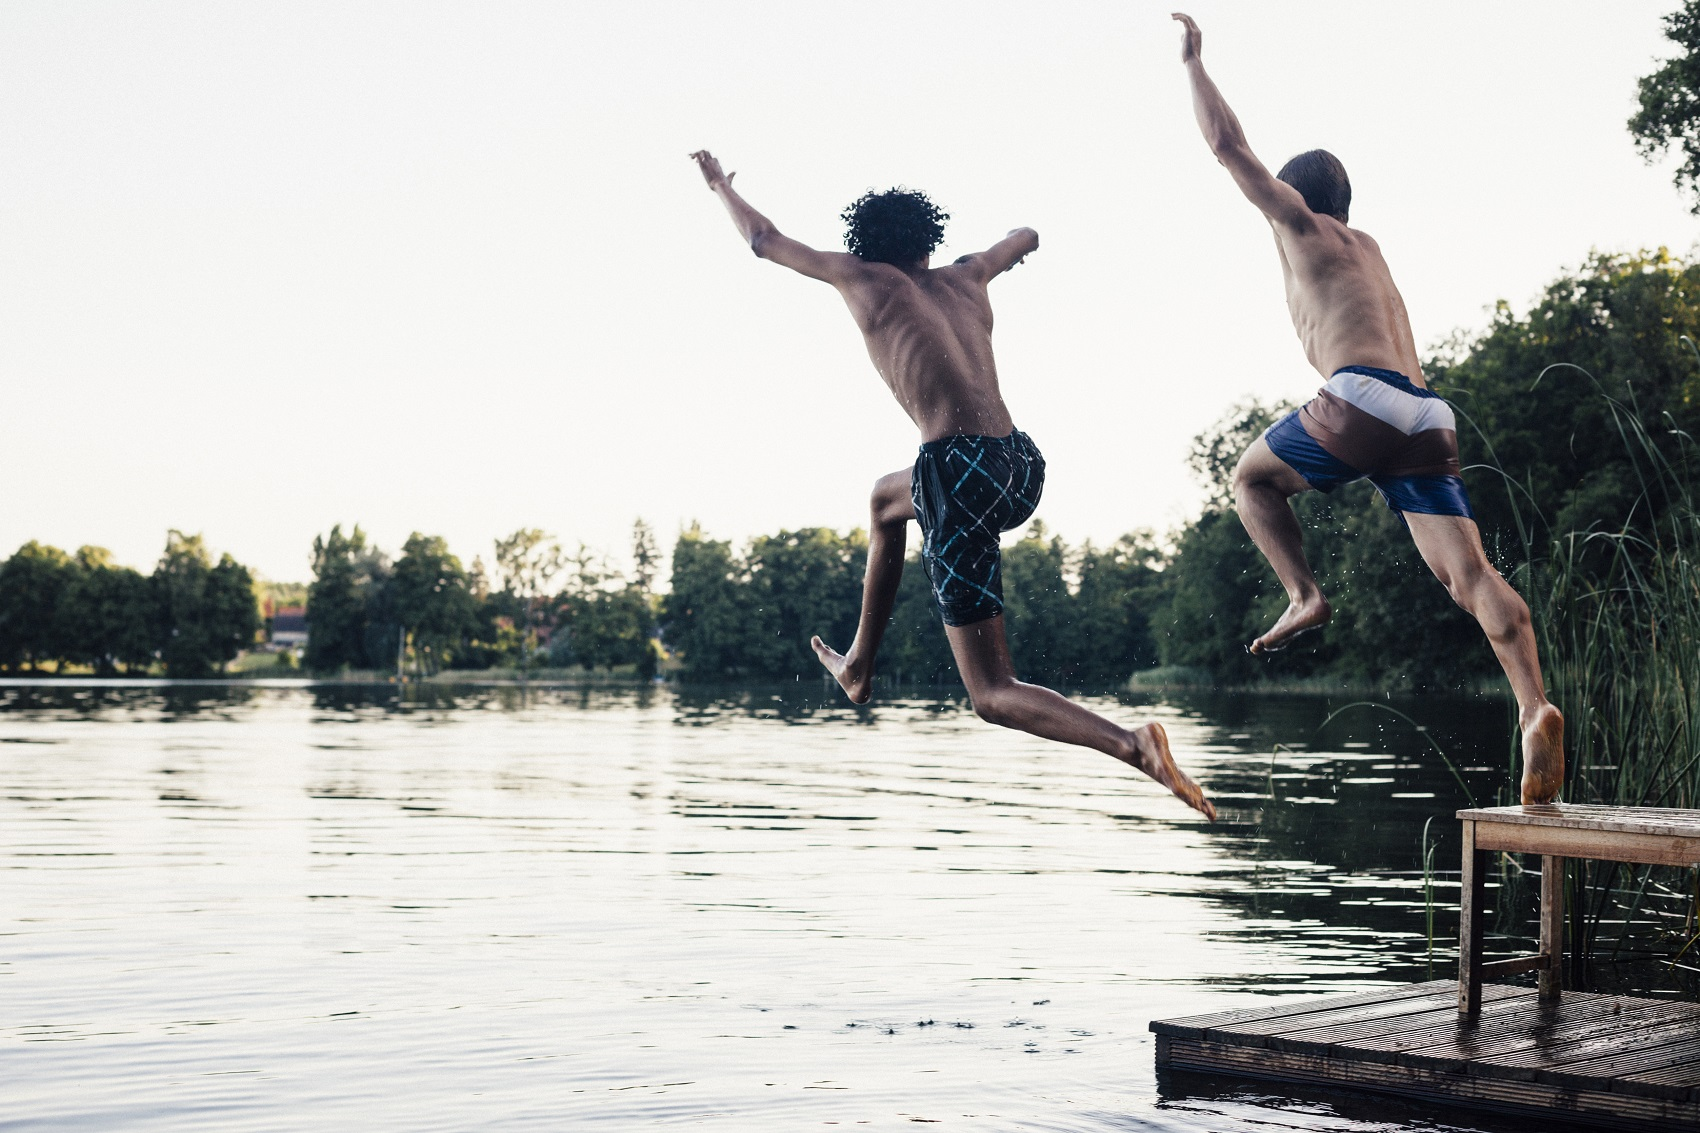 hampstead-wild-swimming-londons-best-spot